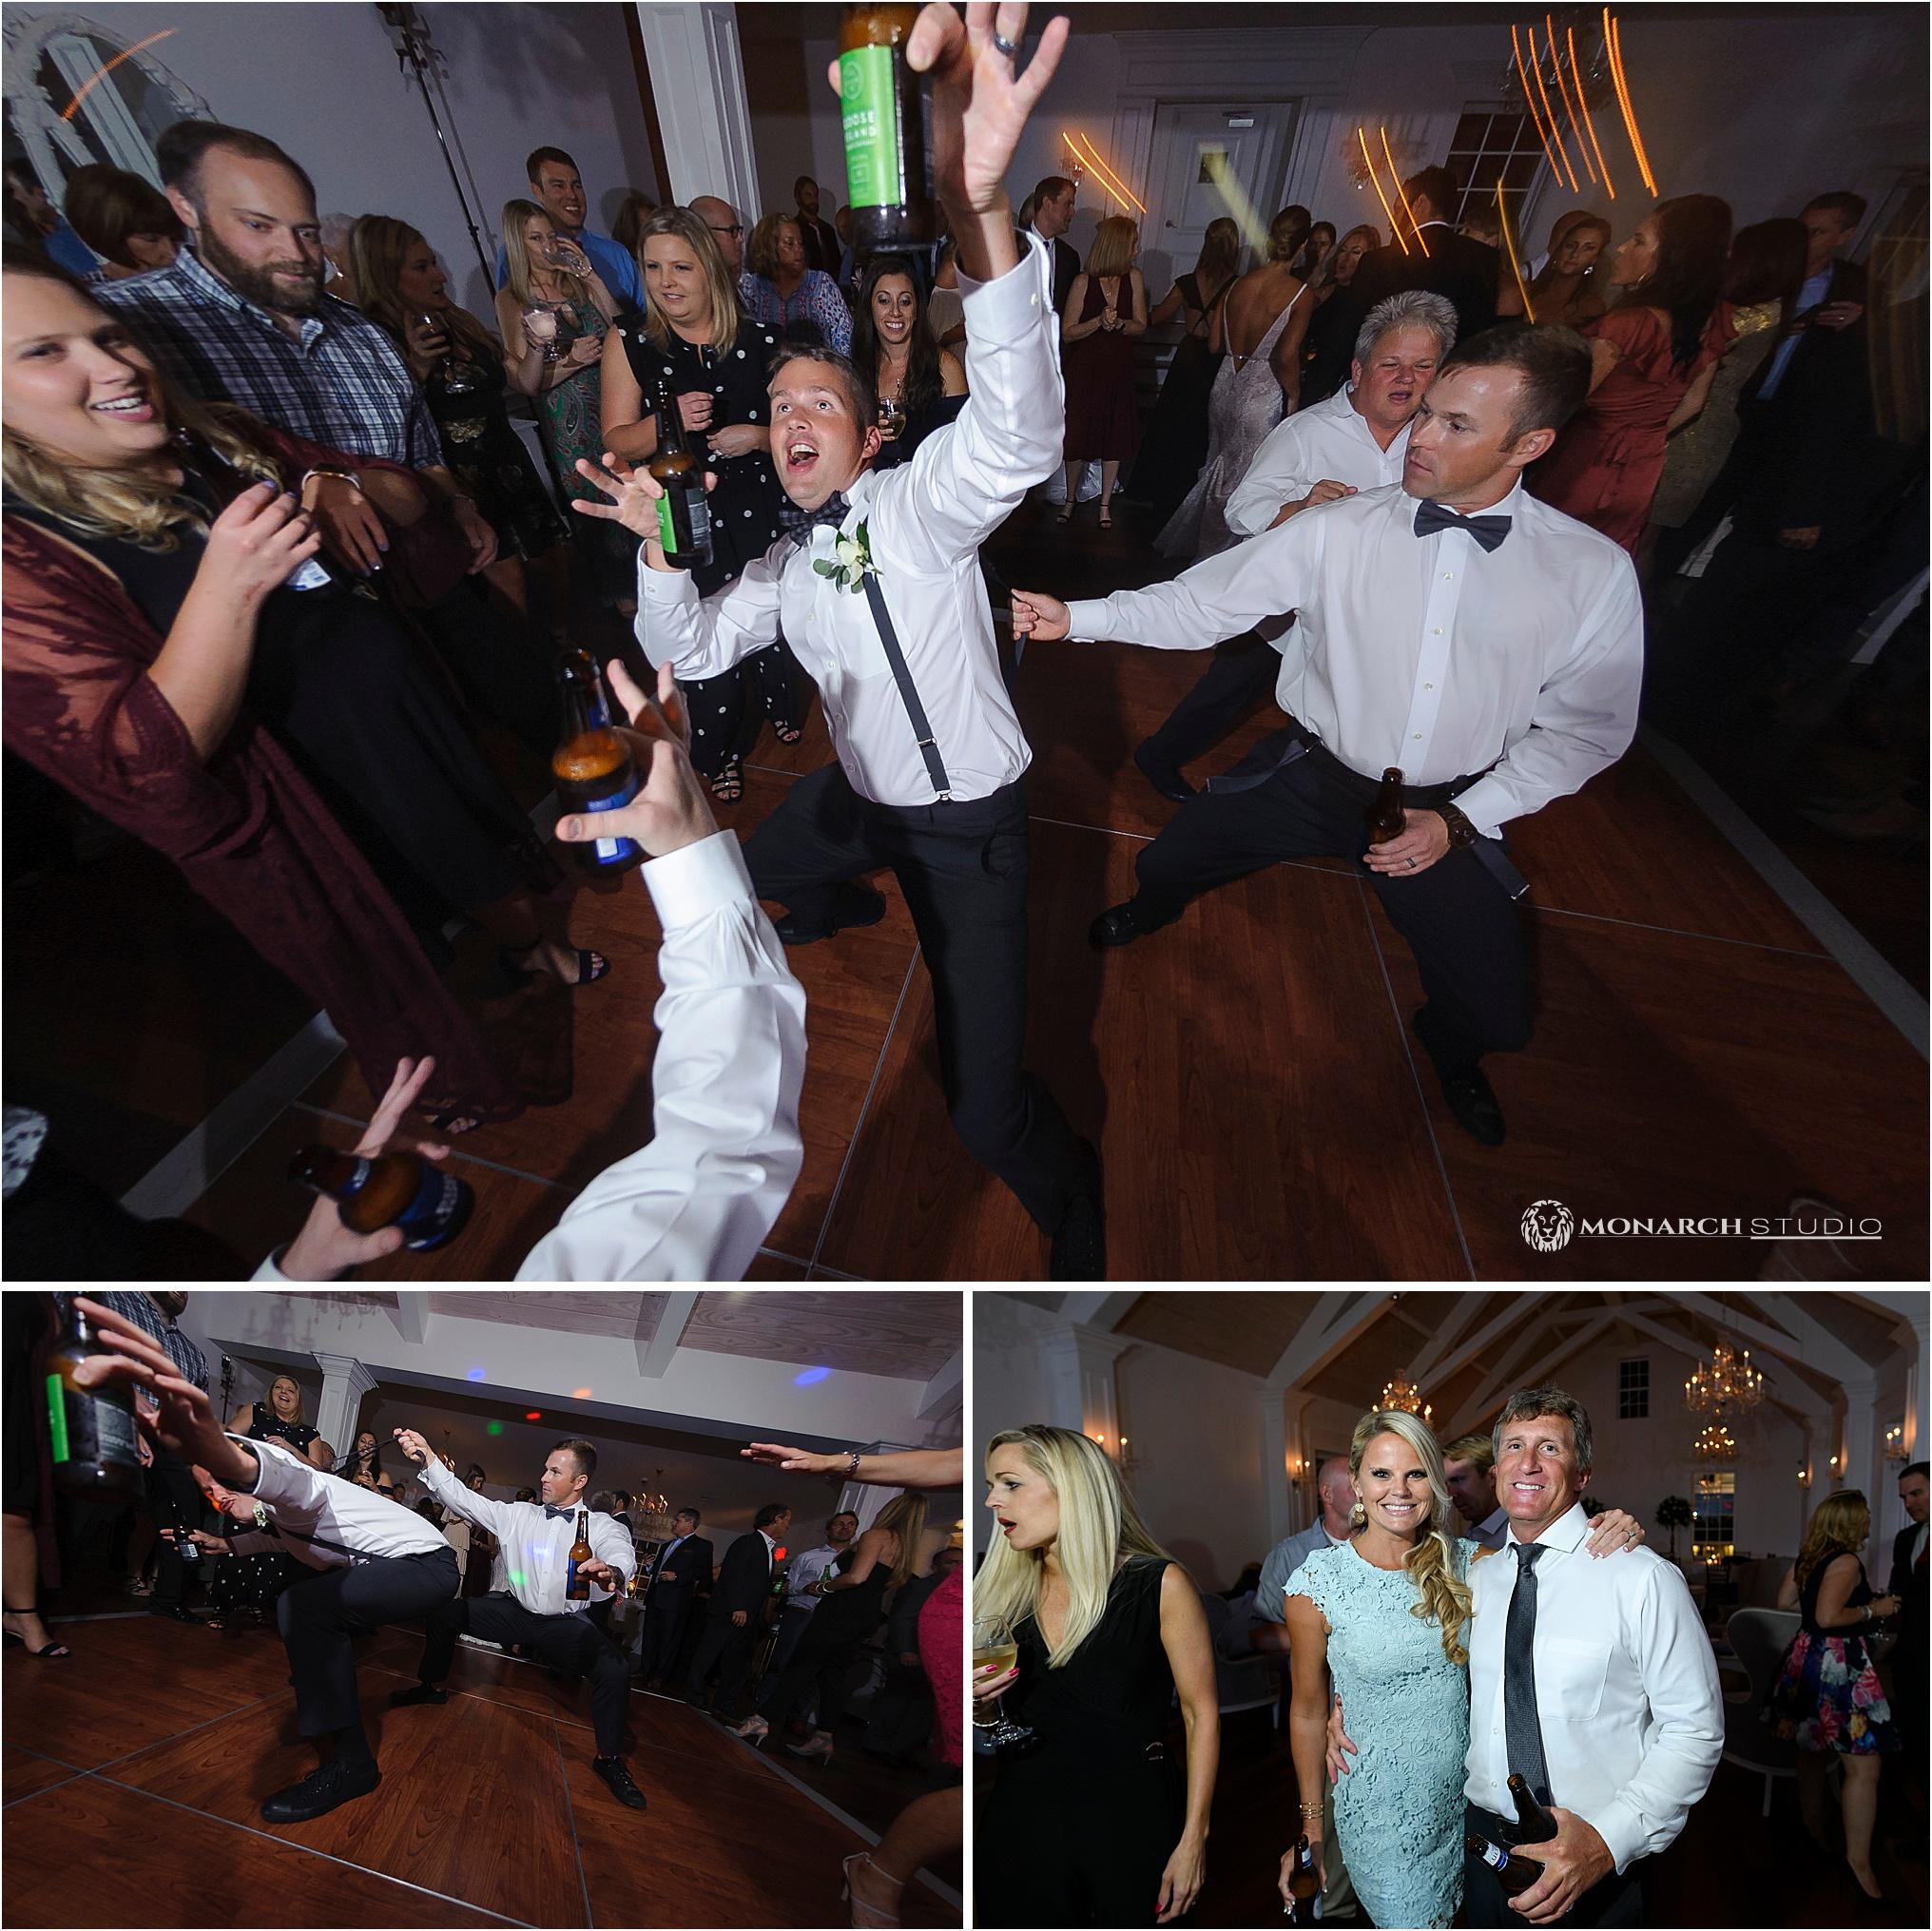 107-whiteroom-wedding-photographer-2019-05-22_0089.jpg